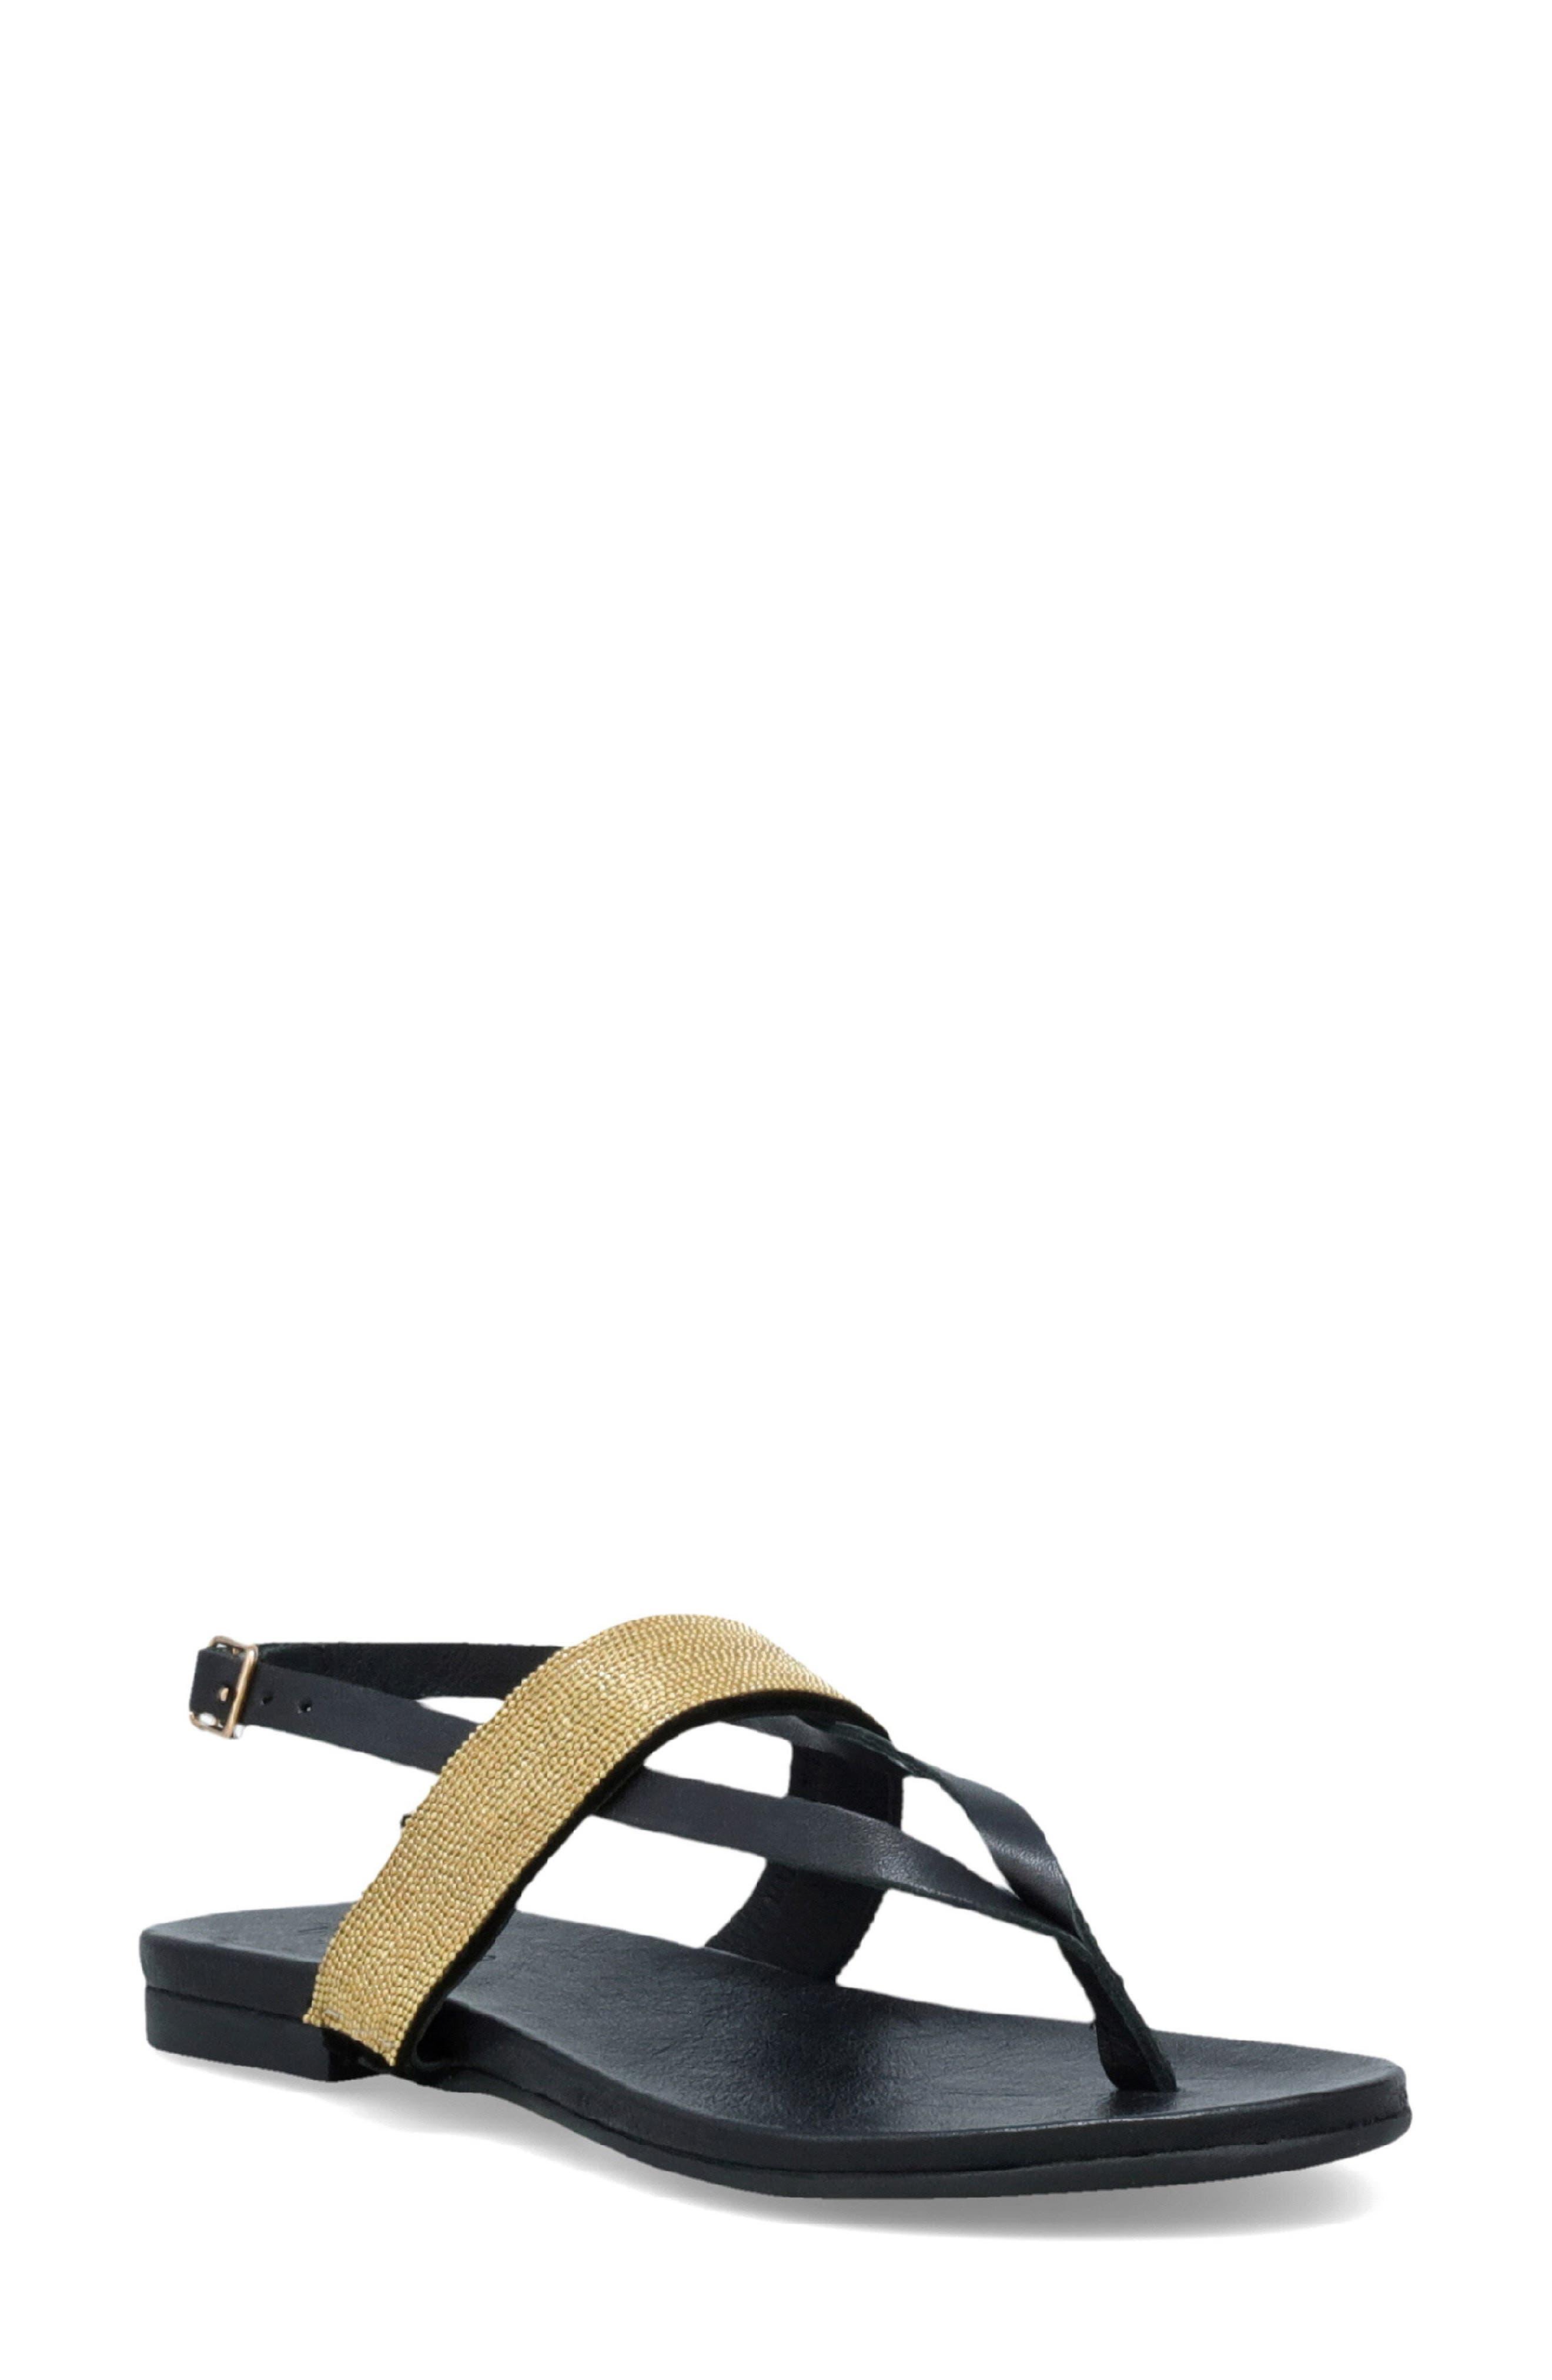 Inuovo Oaklie Strappy Sandal